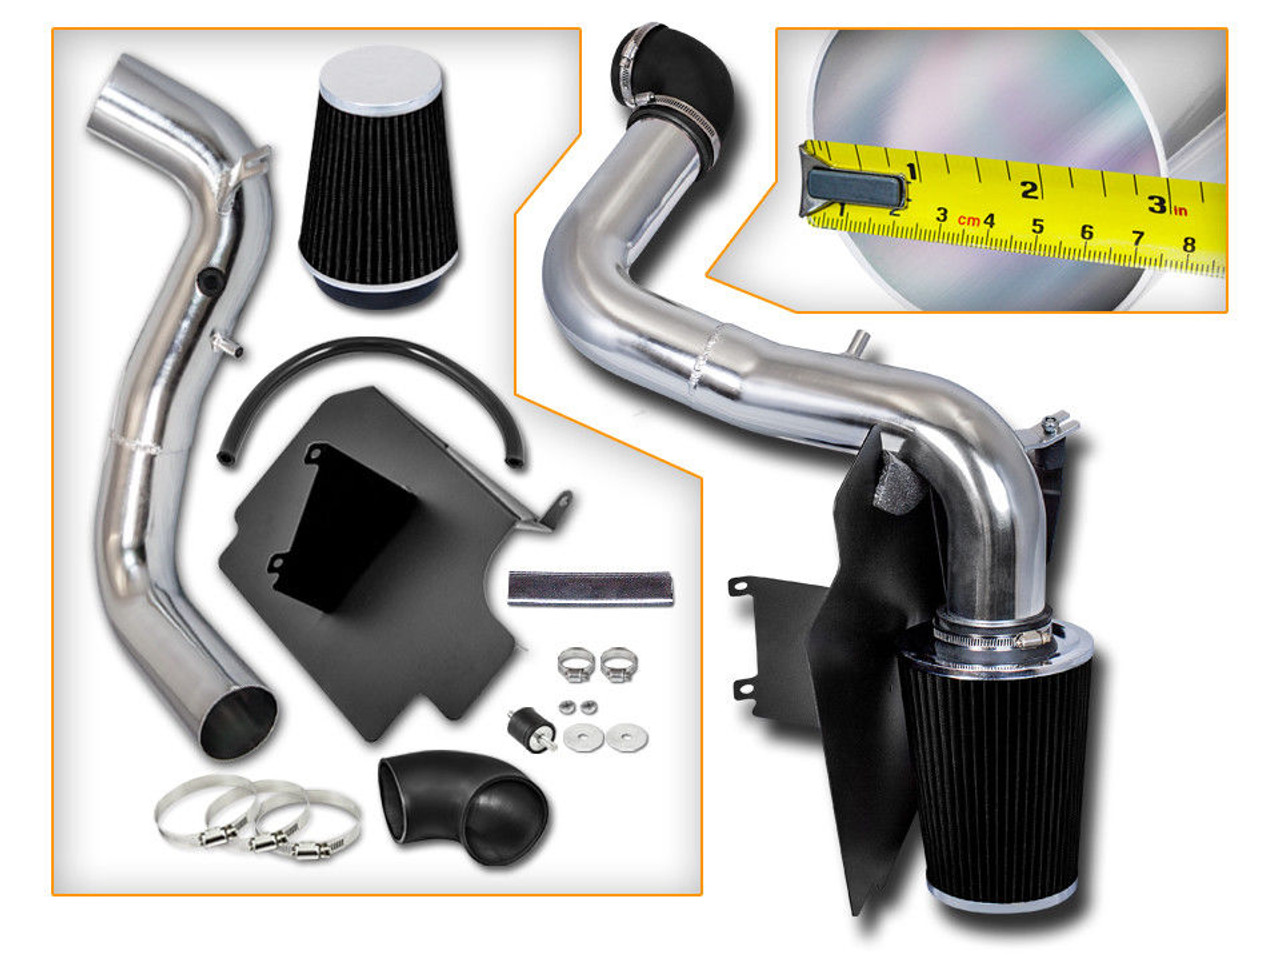 hight resolution of 2003 chevy s10 2 2 liter engine